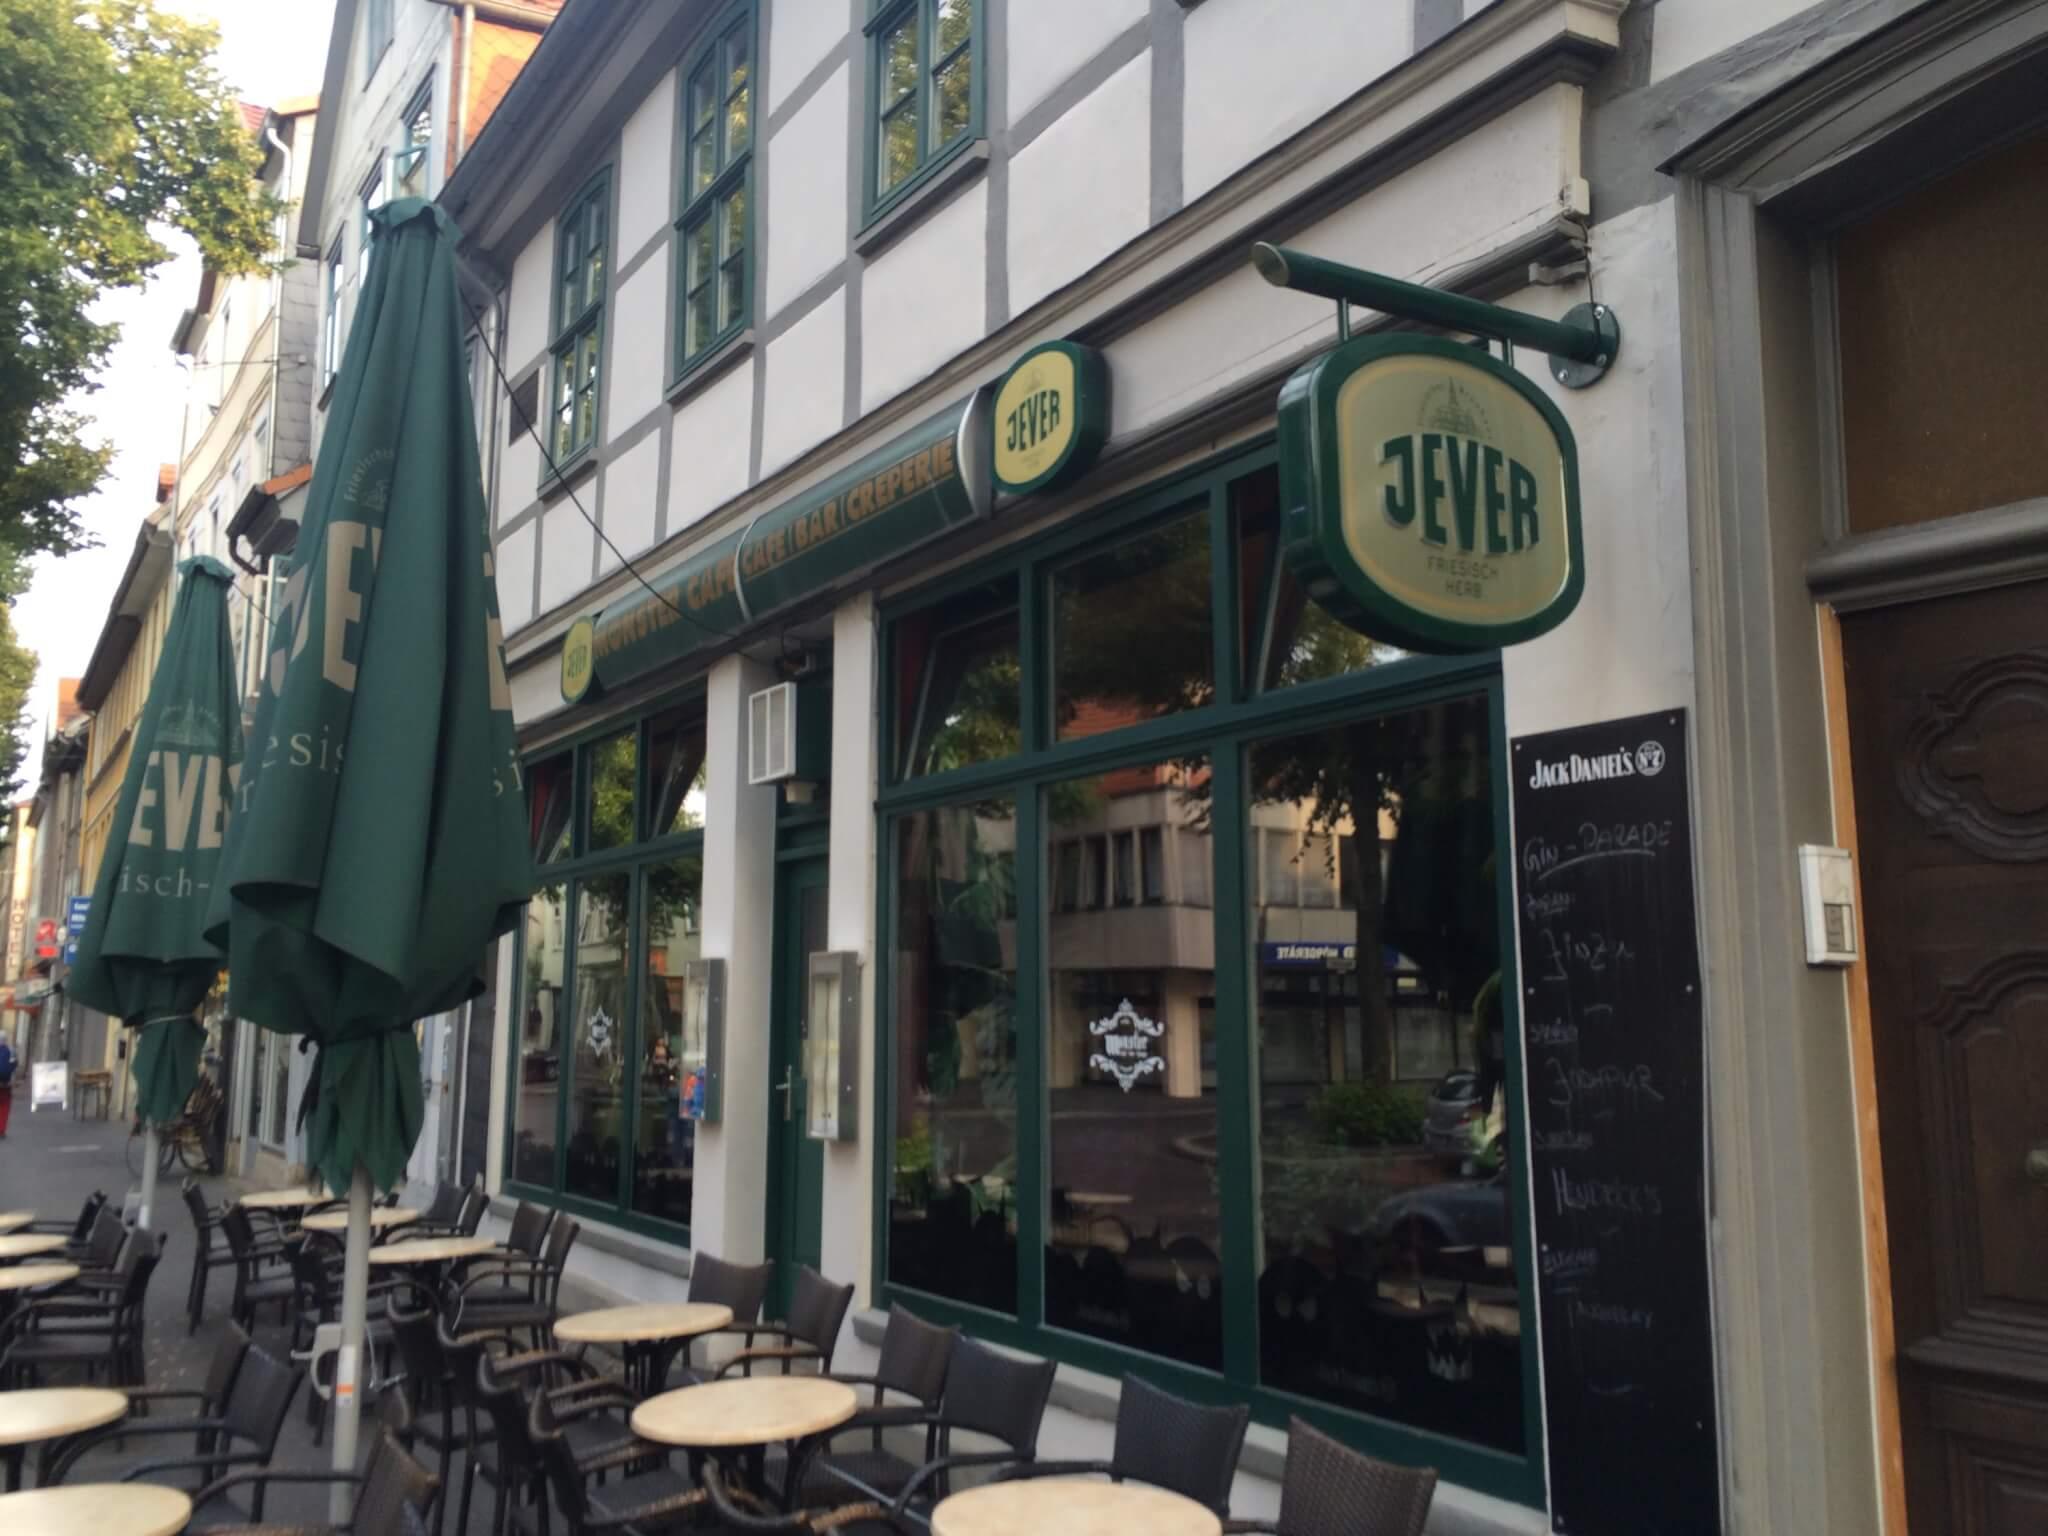 Monster Café, Göttingen